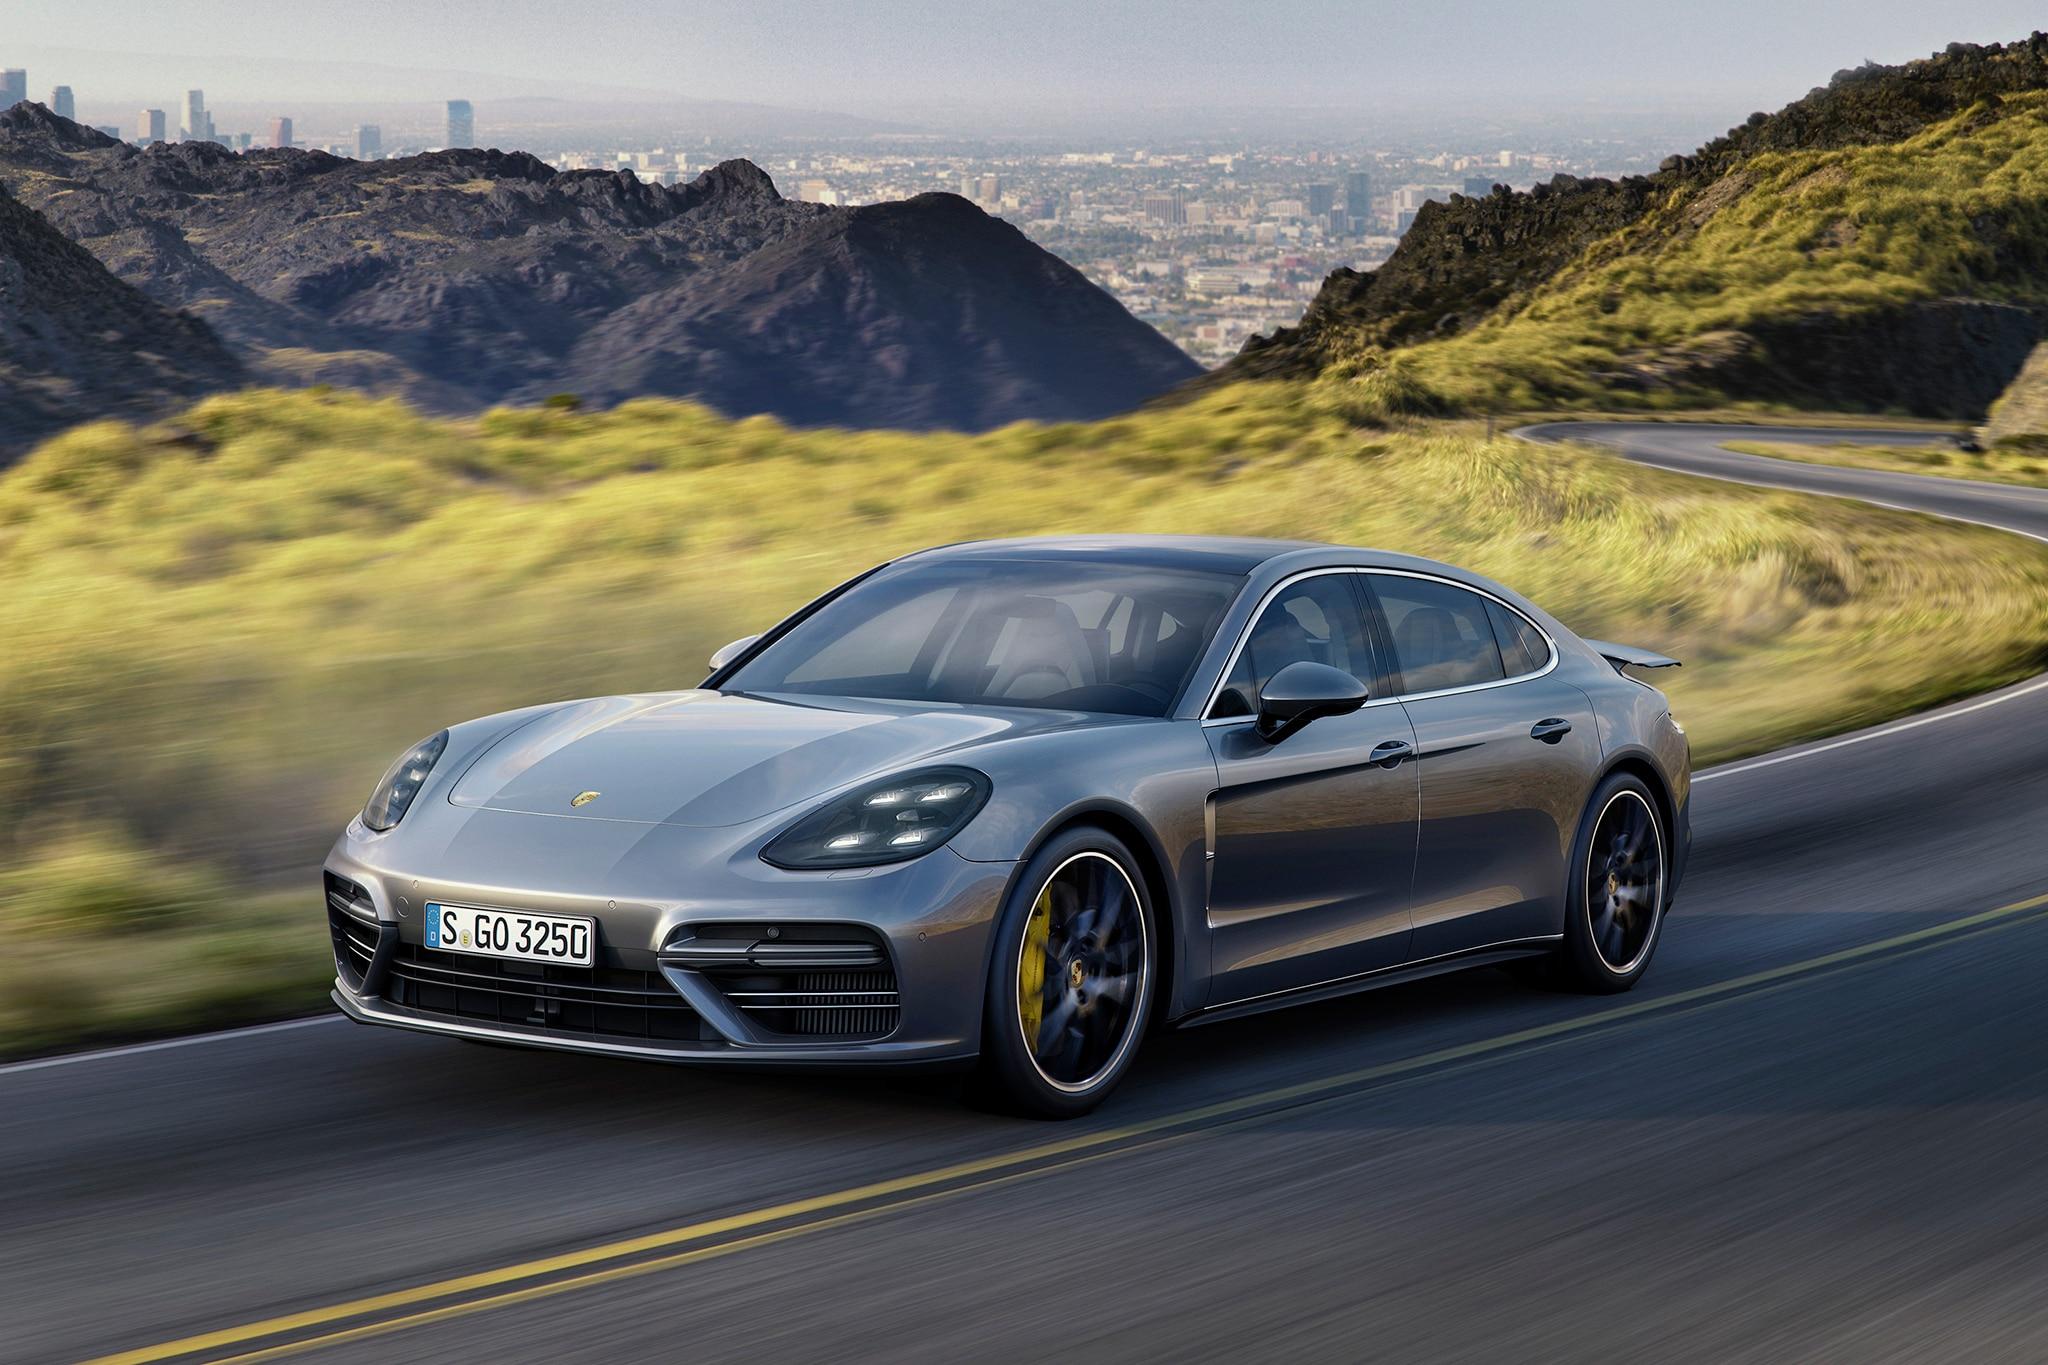 2017 Porsche Panamera Turbo Executive Front Three Quarter In Motion 01